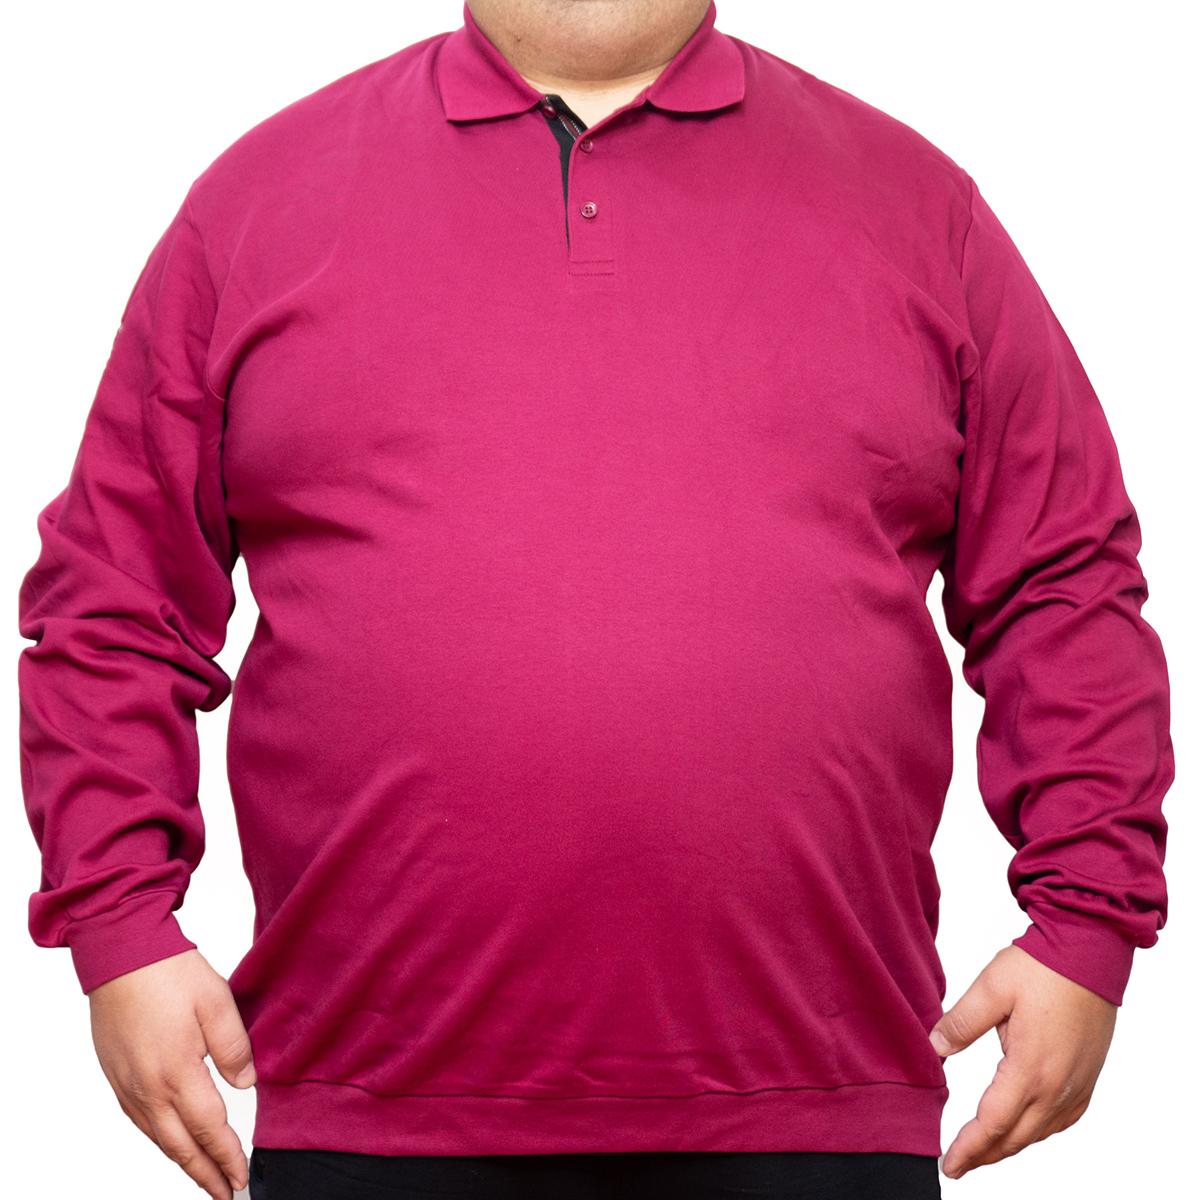 Bluza subtire  cu guler , Marime 7XL - egato.ro